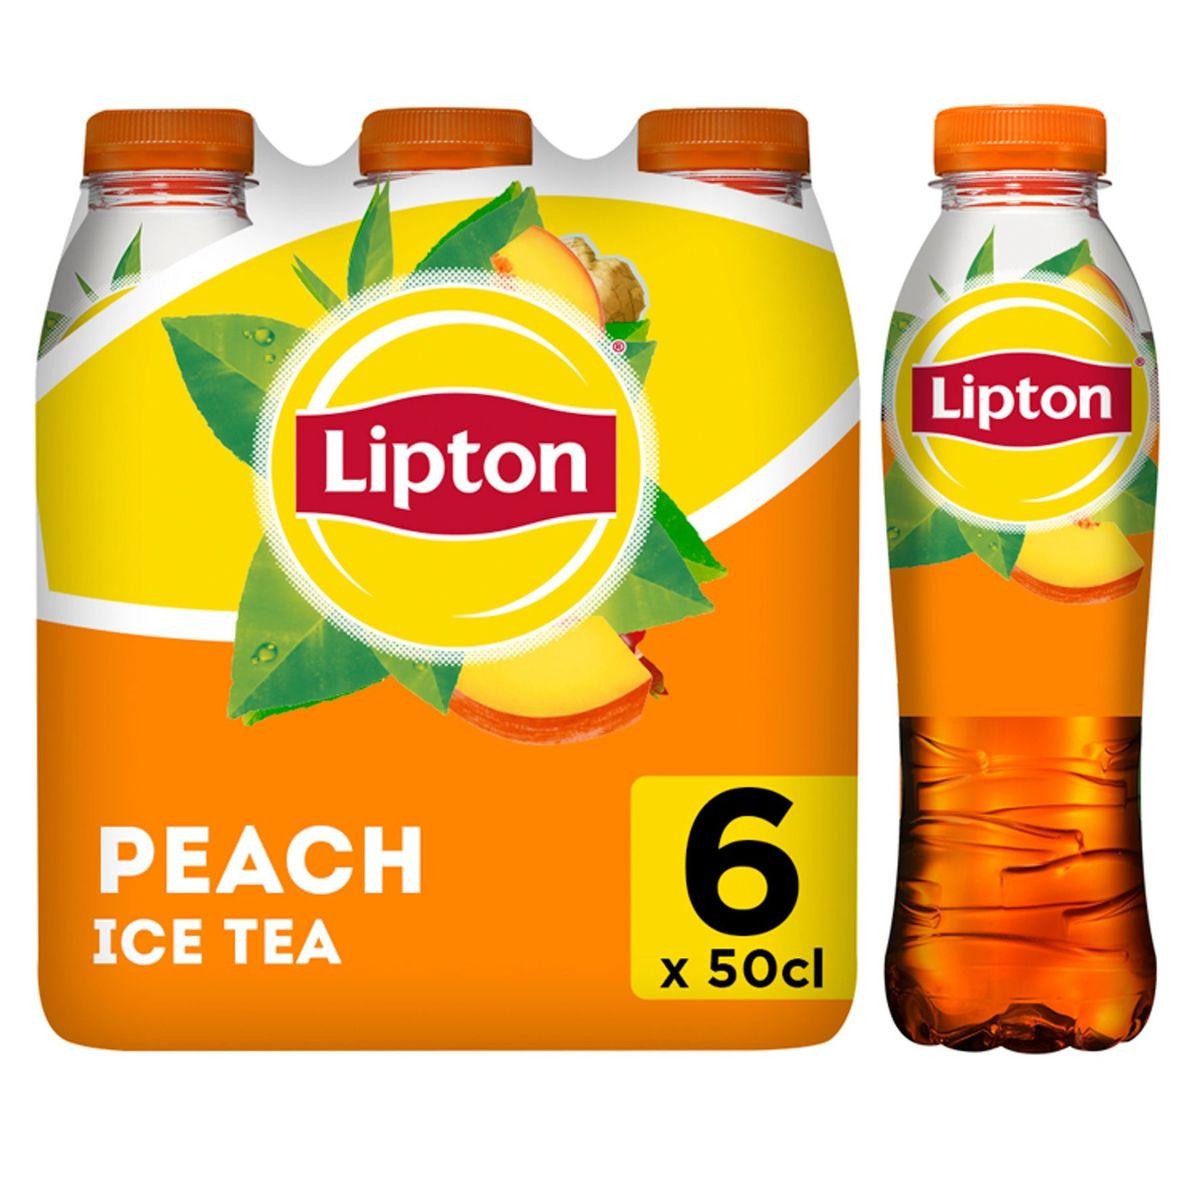 Lipton Iced Tea Thé Glacé Pêche fiable en calories 6 x 50 cl